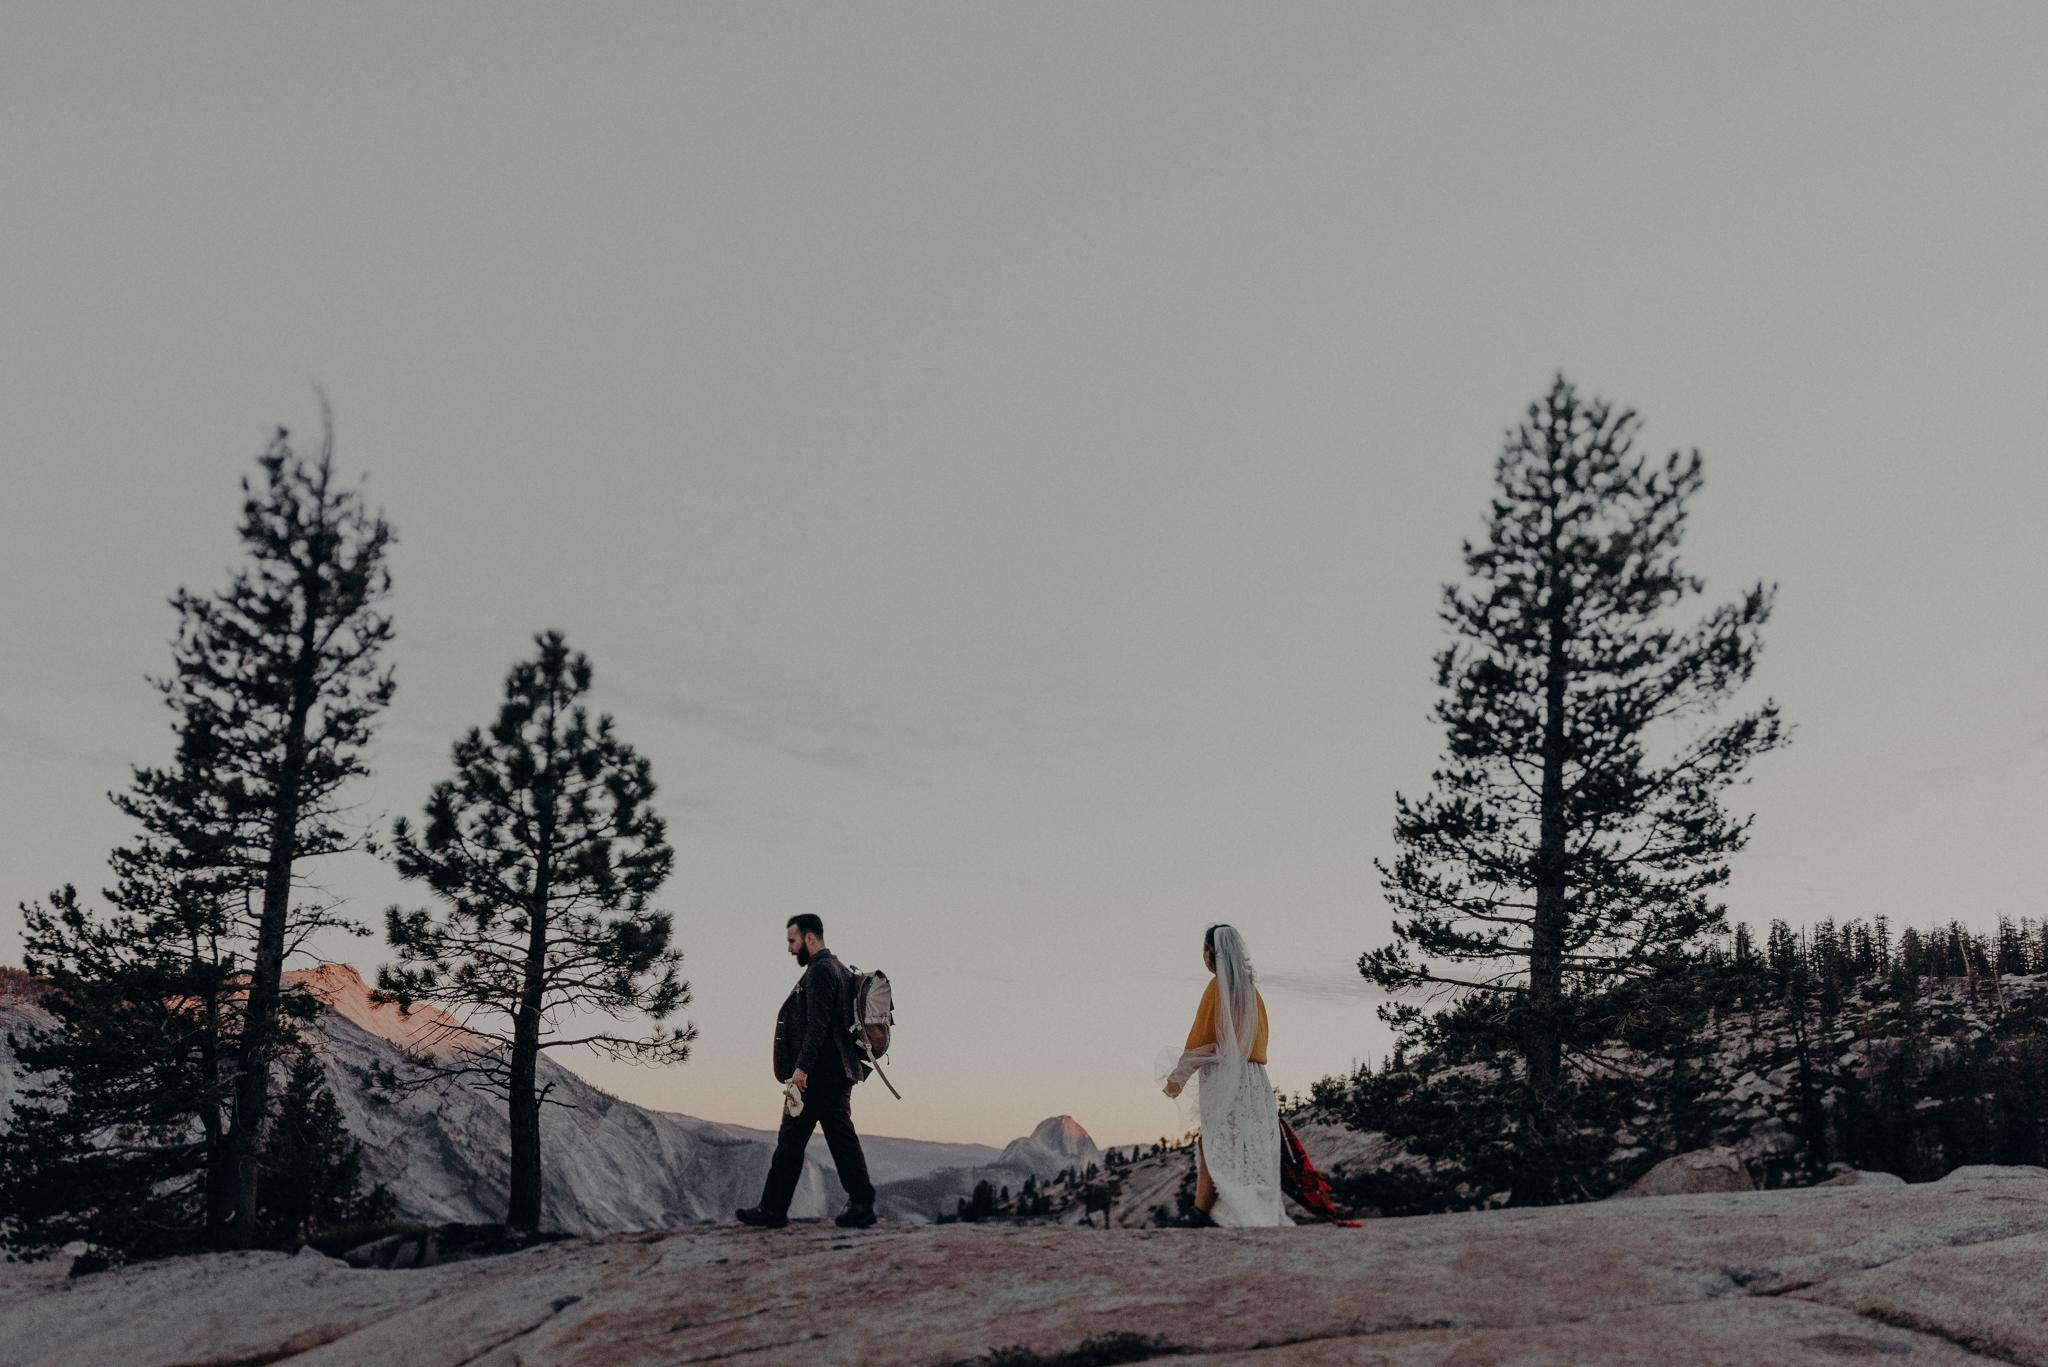 Yosemite Elopement Photographer - Evergreen Lodge Wedding Photographer - IsaiahAndTaylor.com-062.jpg